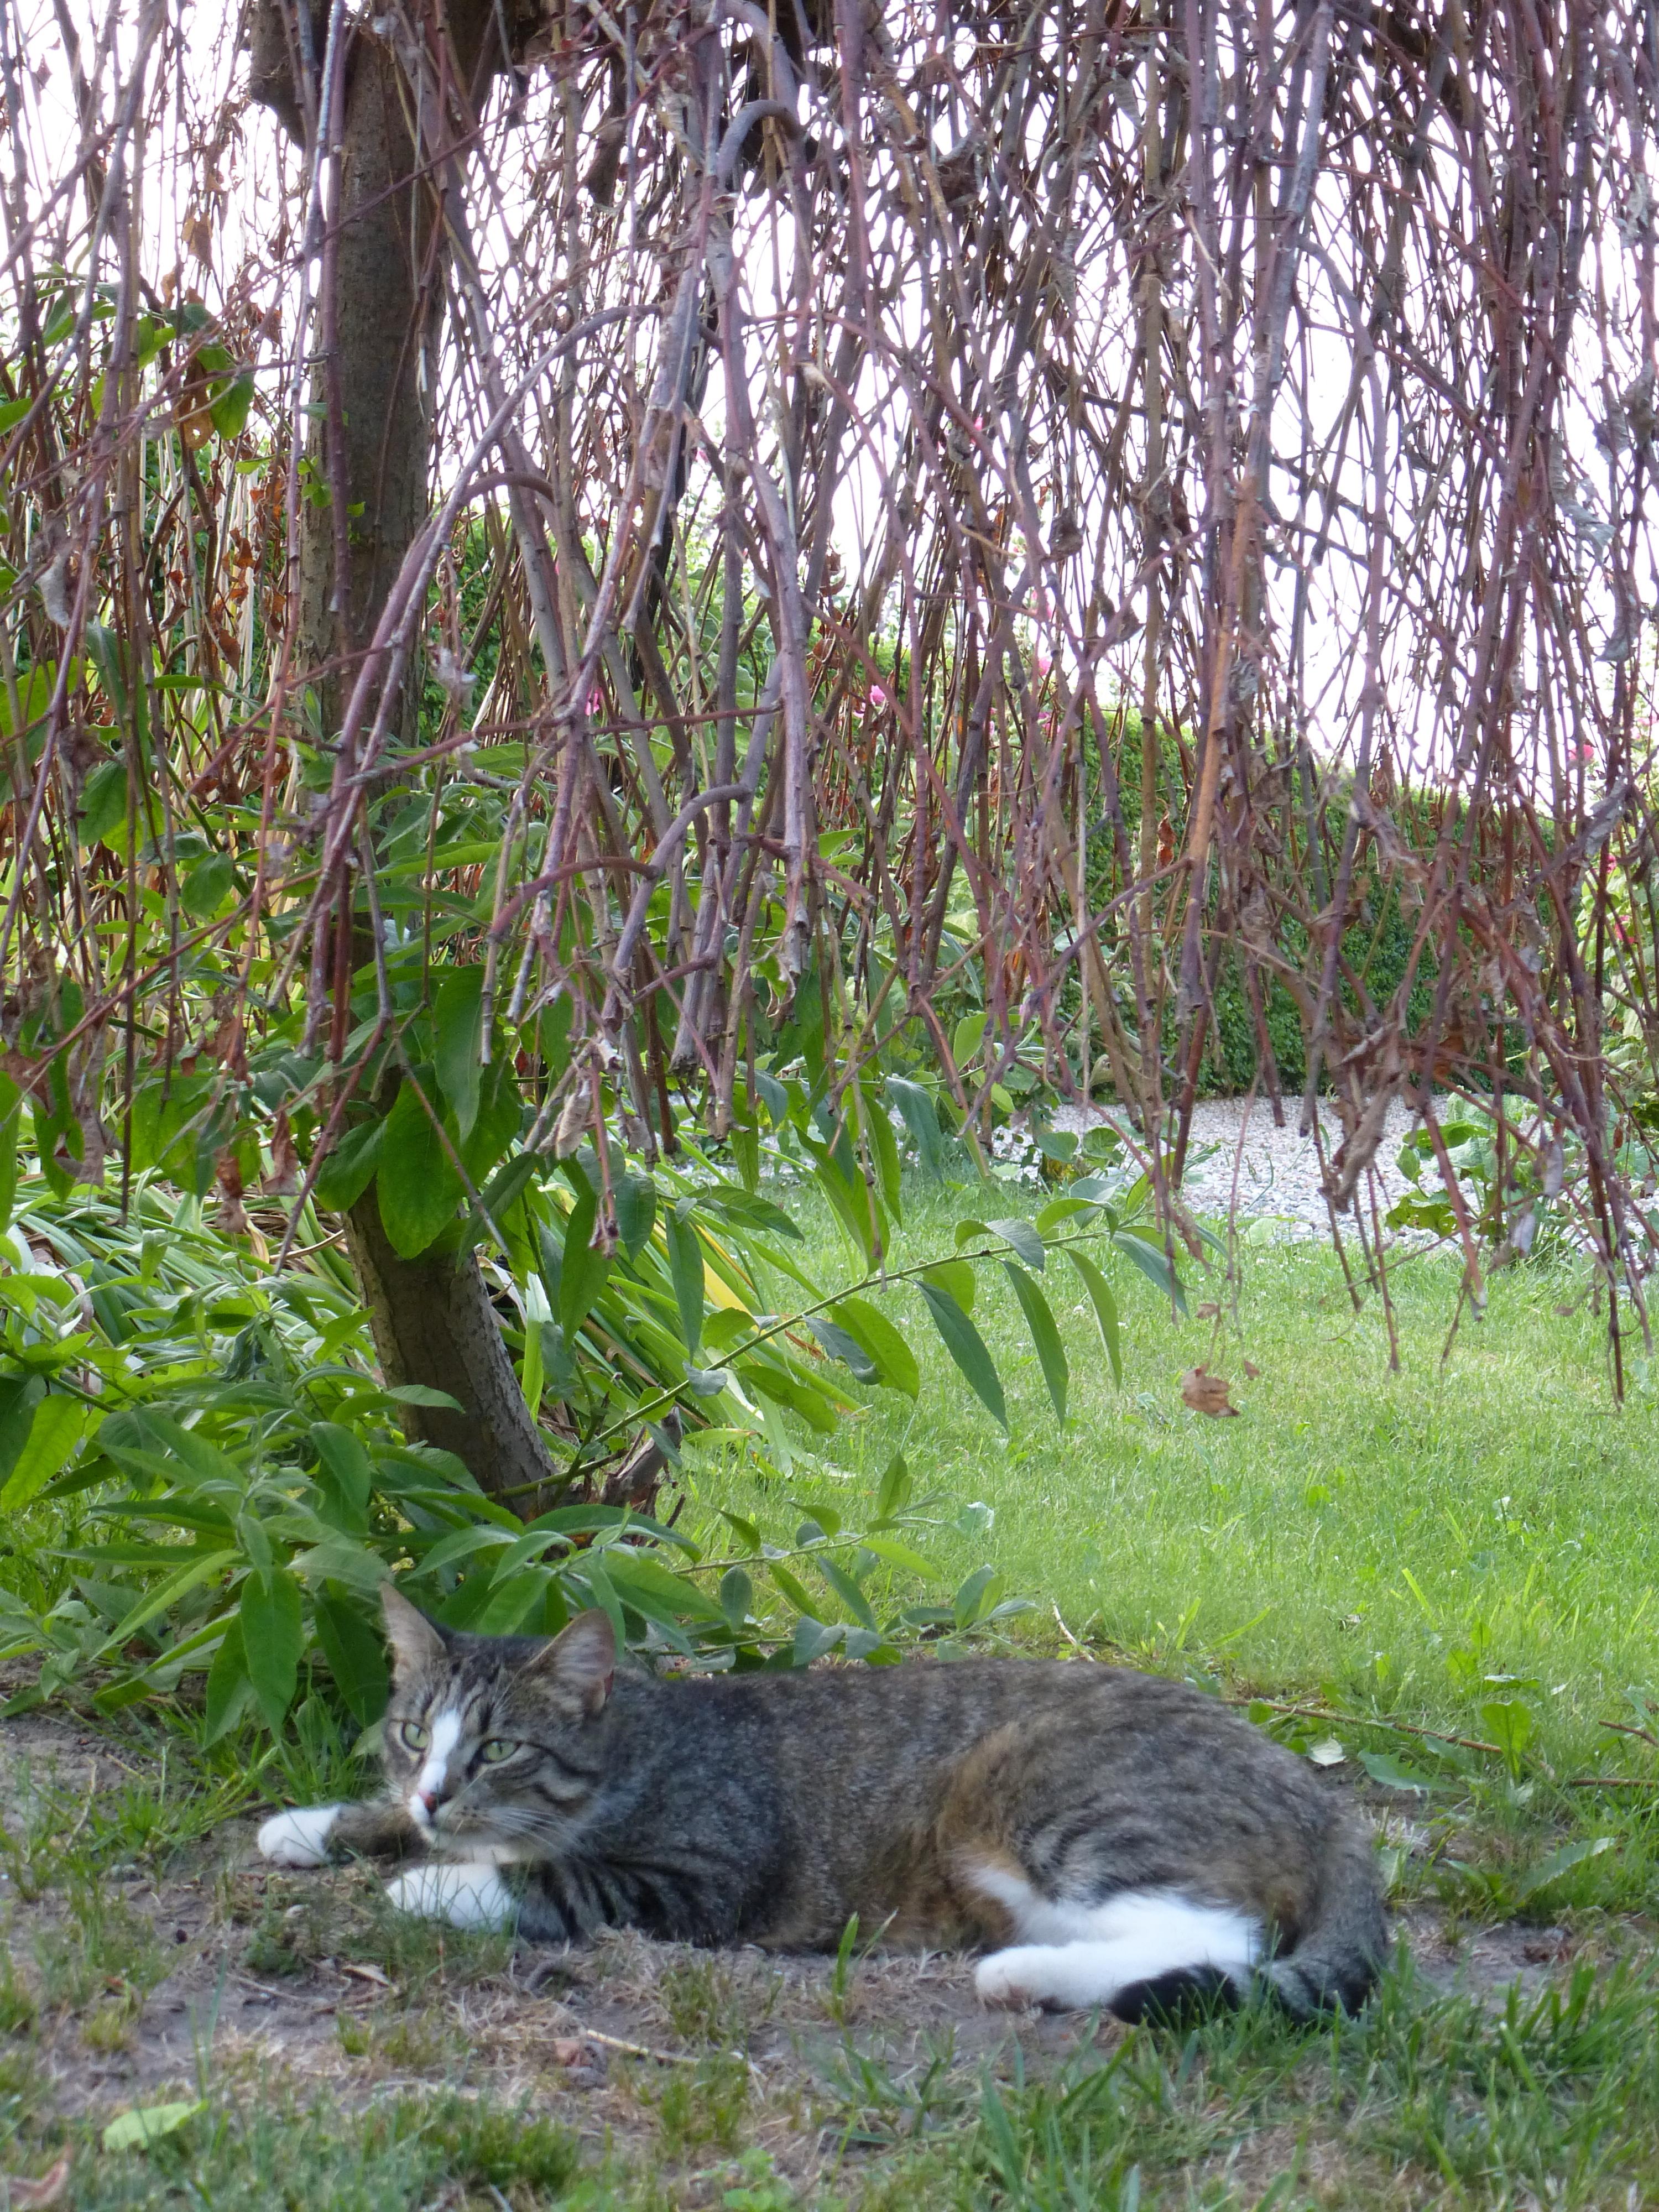 Hili under trees